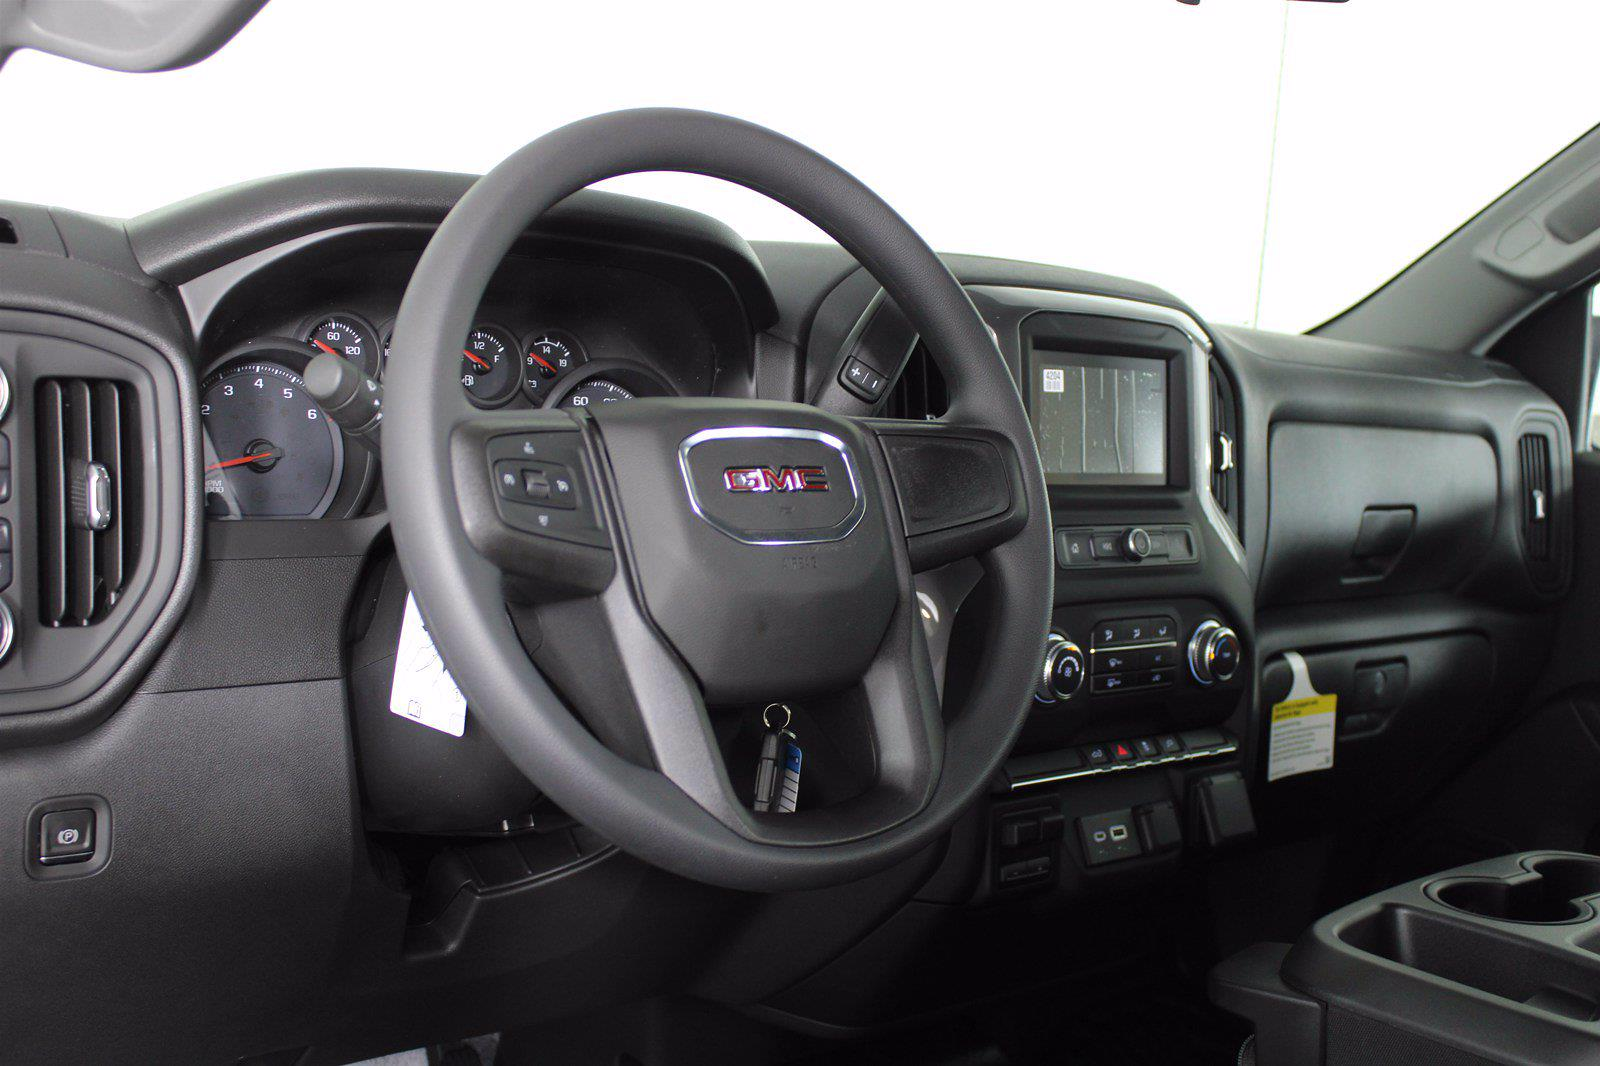 2021 GMC Sierra 1500 Regular Cab 4x4, Pickup #D411131 - photo 10